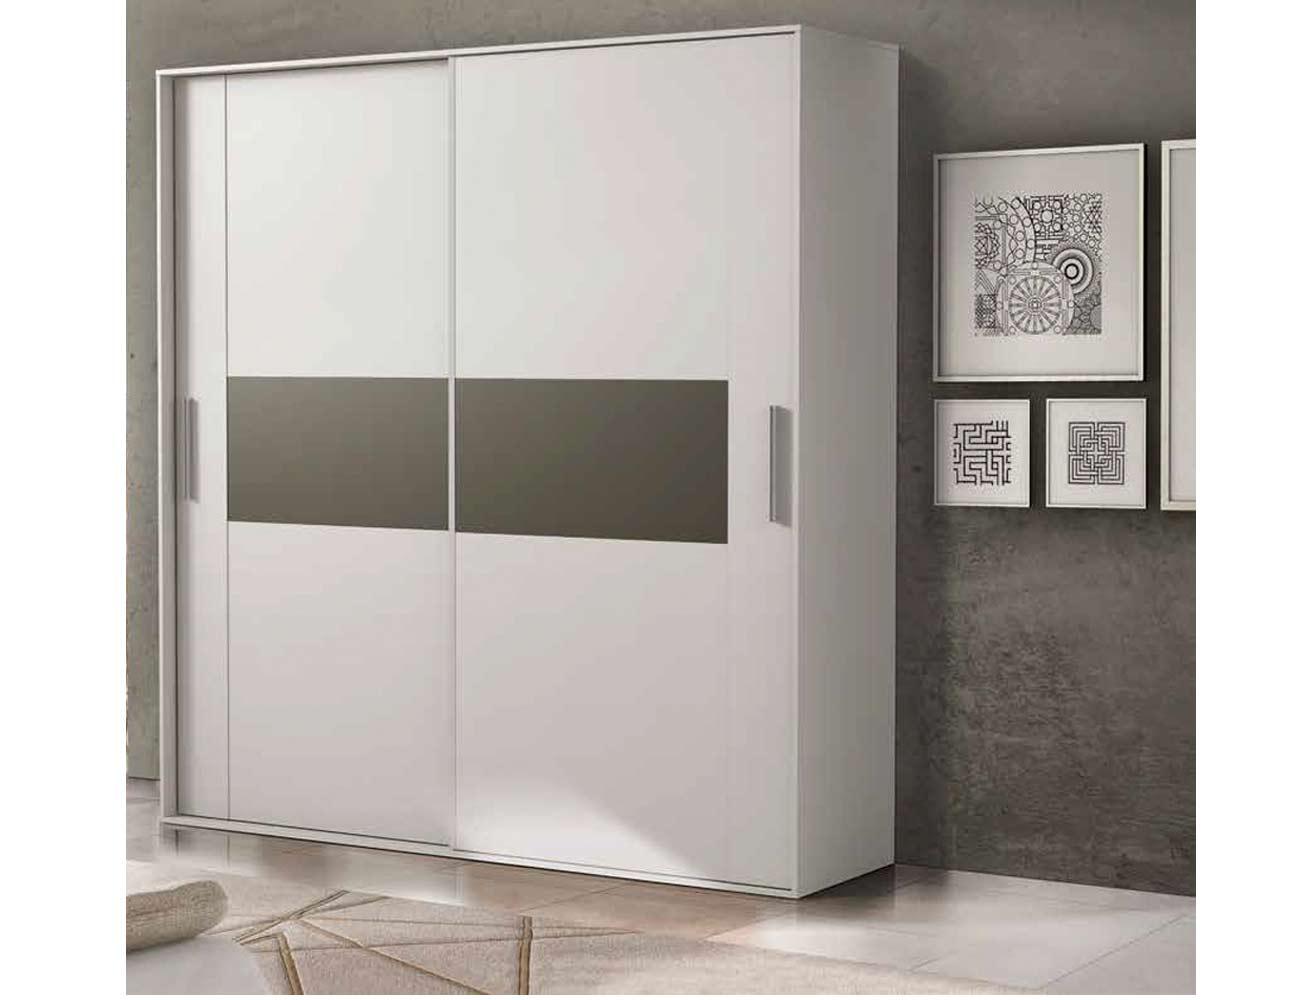 Armario 2 puertas correderas moderno blanco grafito